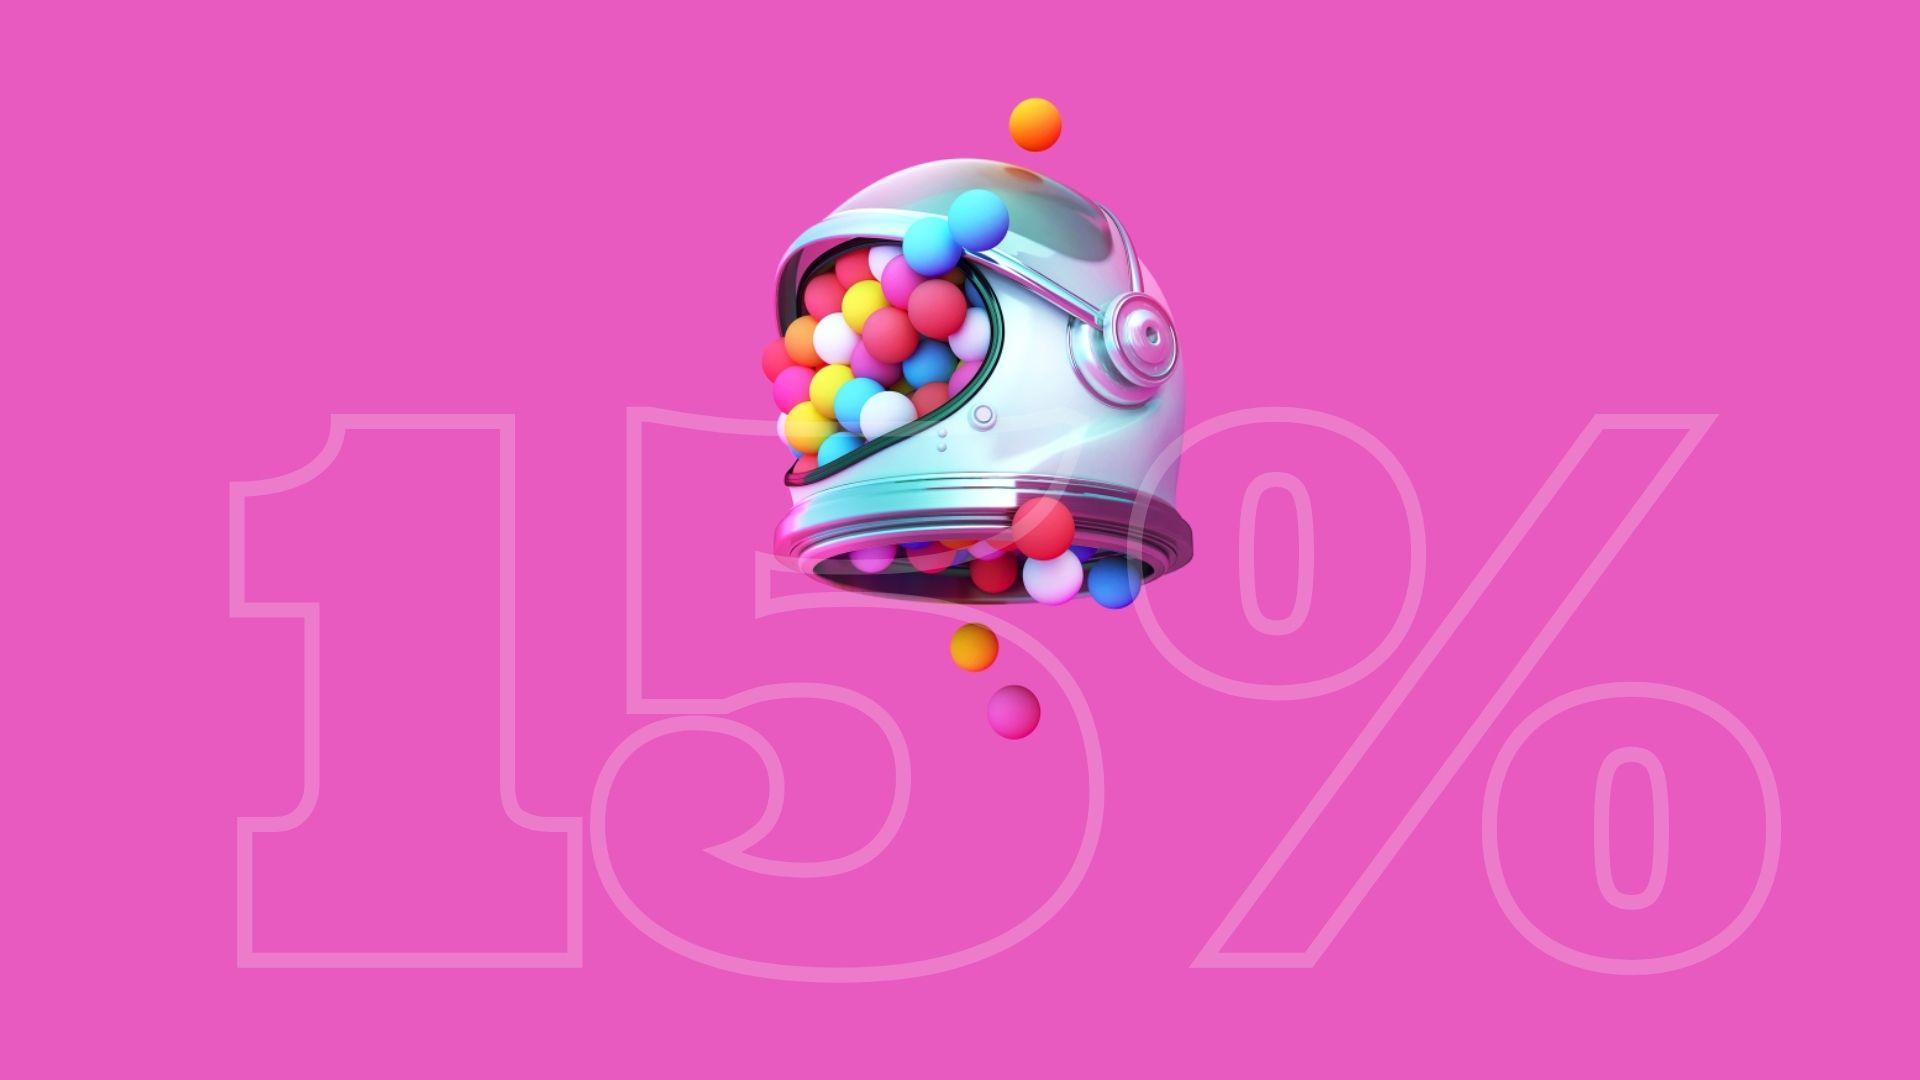 самая выгодная дебетовая карта дня кэшбэк 15%